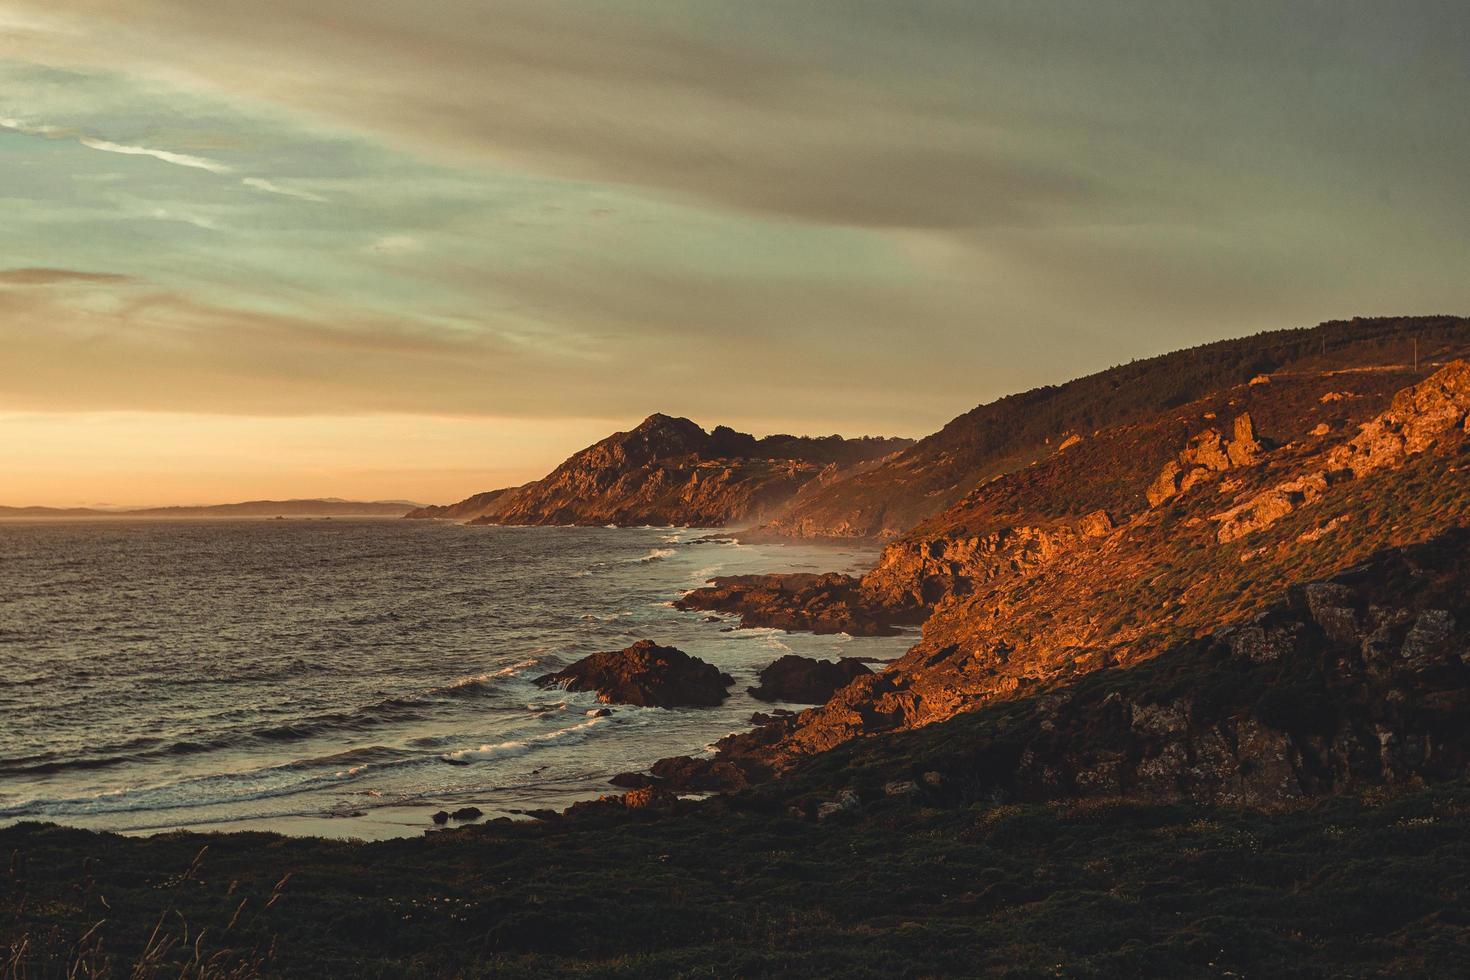 côte espagnole sauvage photo